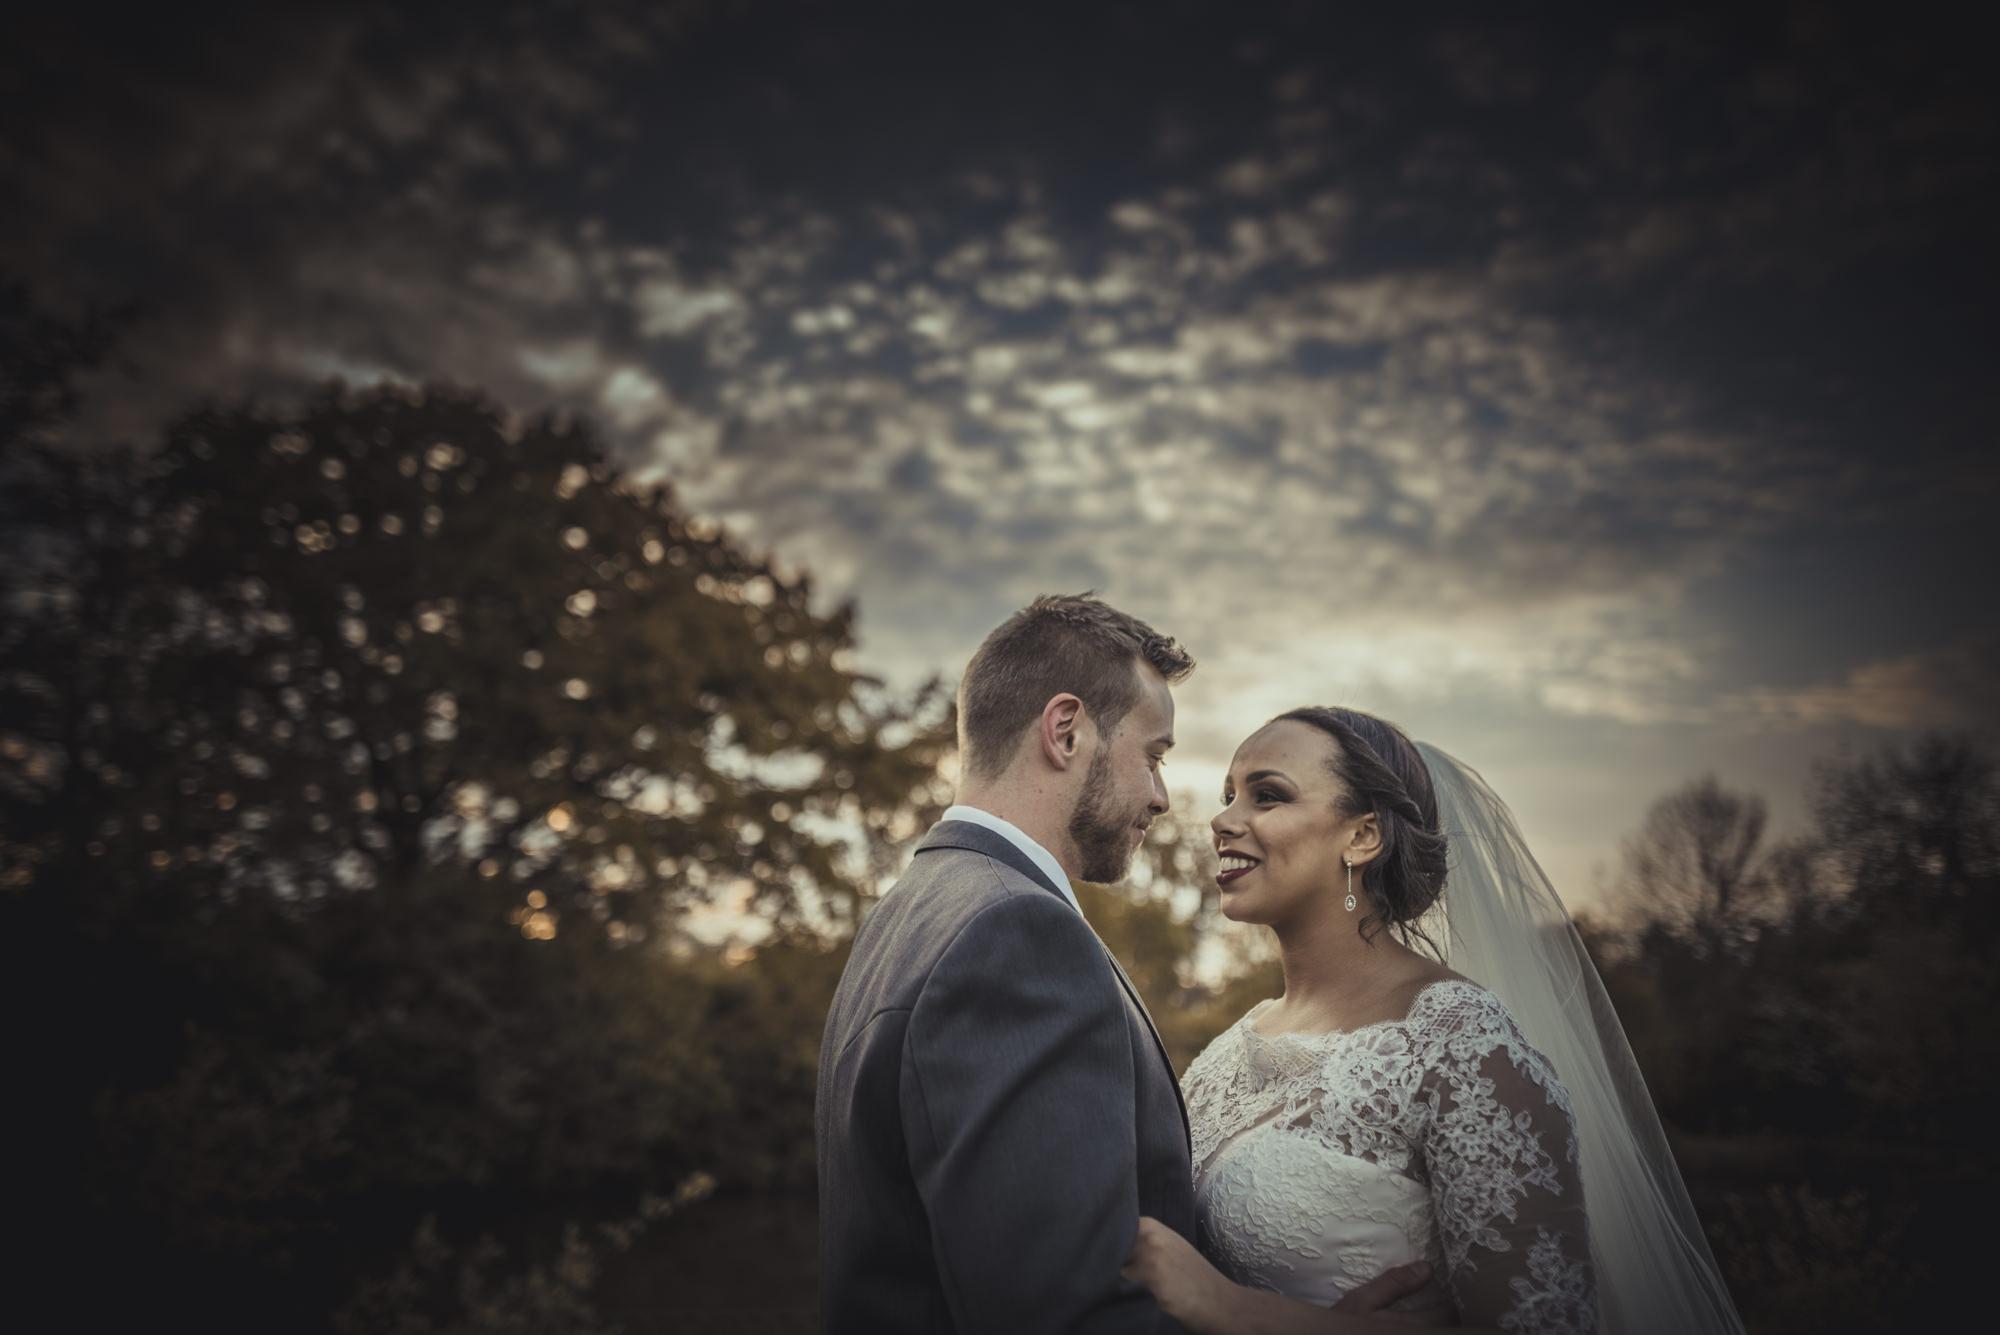 Jacqueline-Gareth-Wedding-Westmead-Events-Surrey-Manu-Mendoza-Wedding-Photography-492.jpg